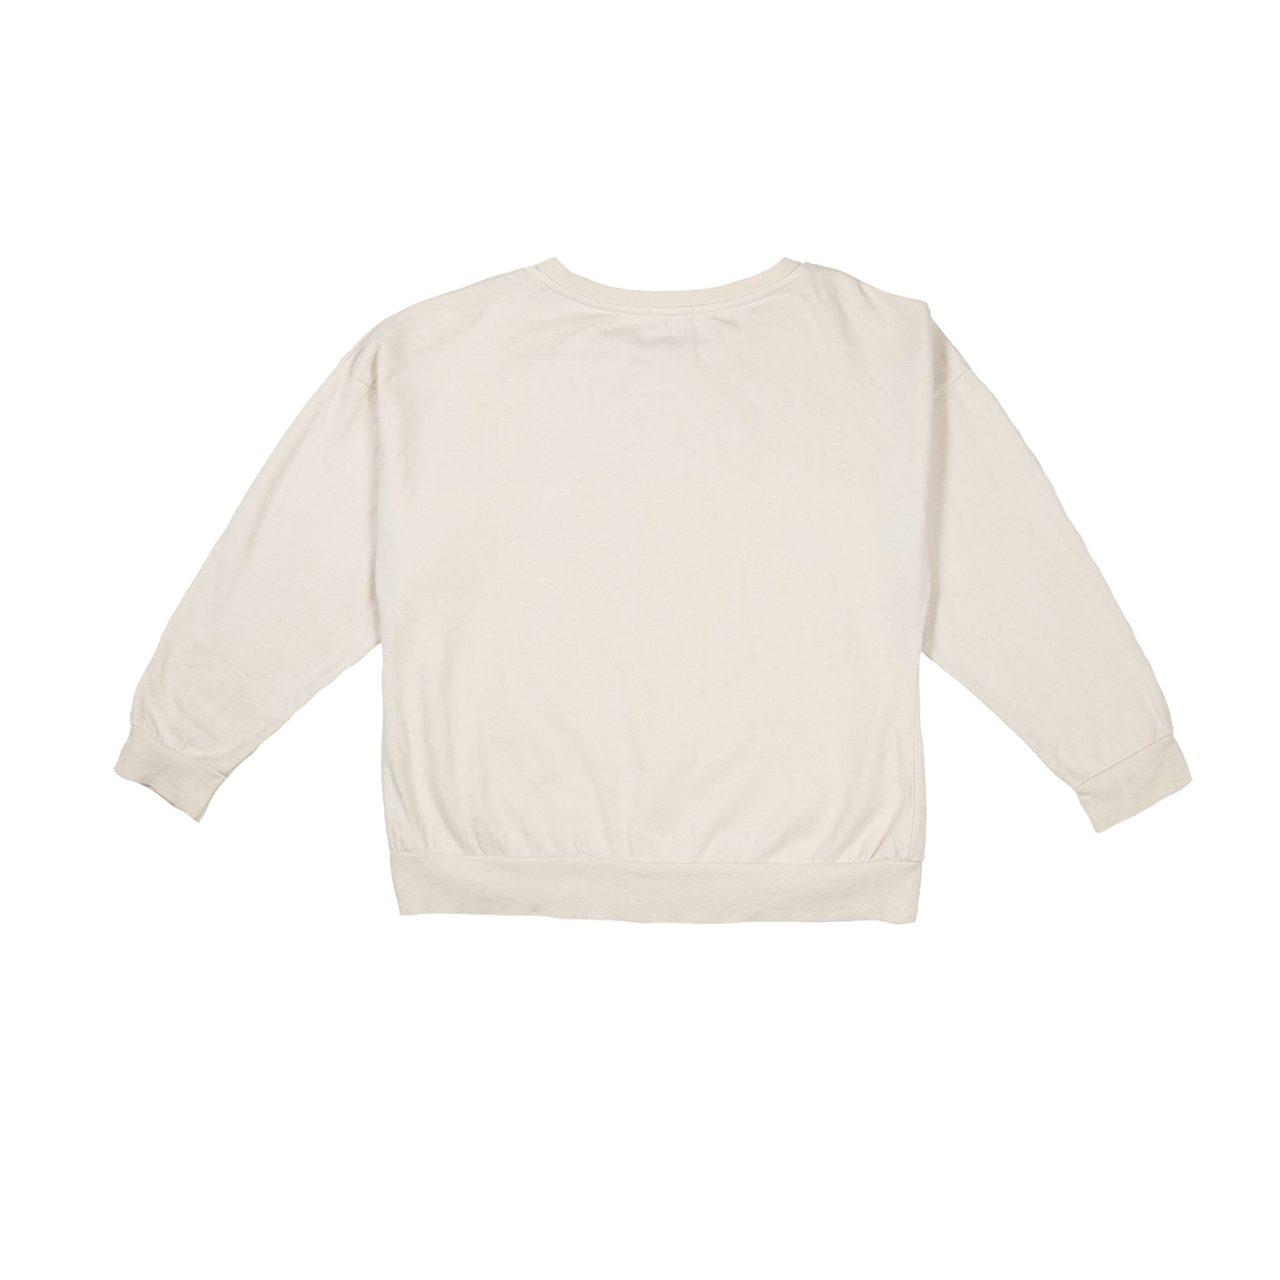 Colorful-lines-sweatshirt